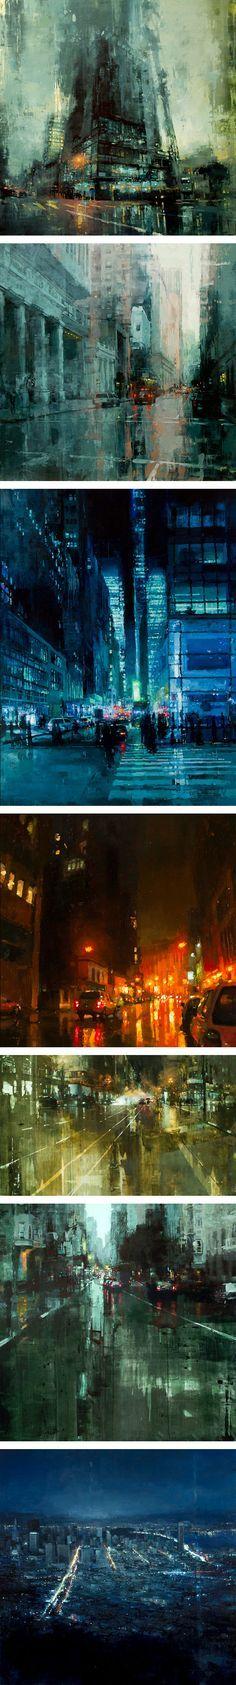 Cityscapes Painted with Oils by Jeremy Mann Lv  Jeremy's artwork..JR